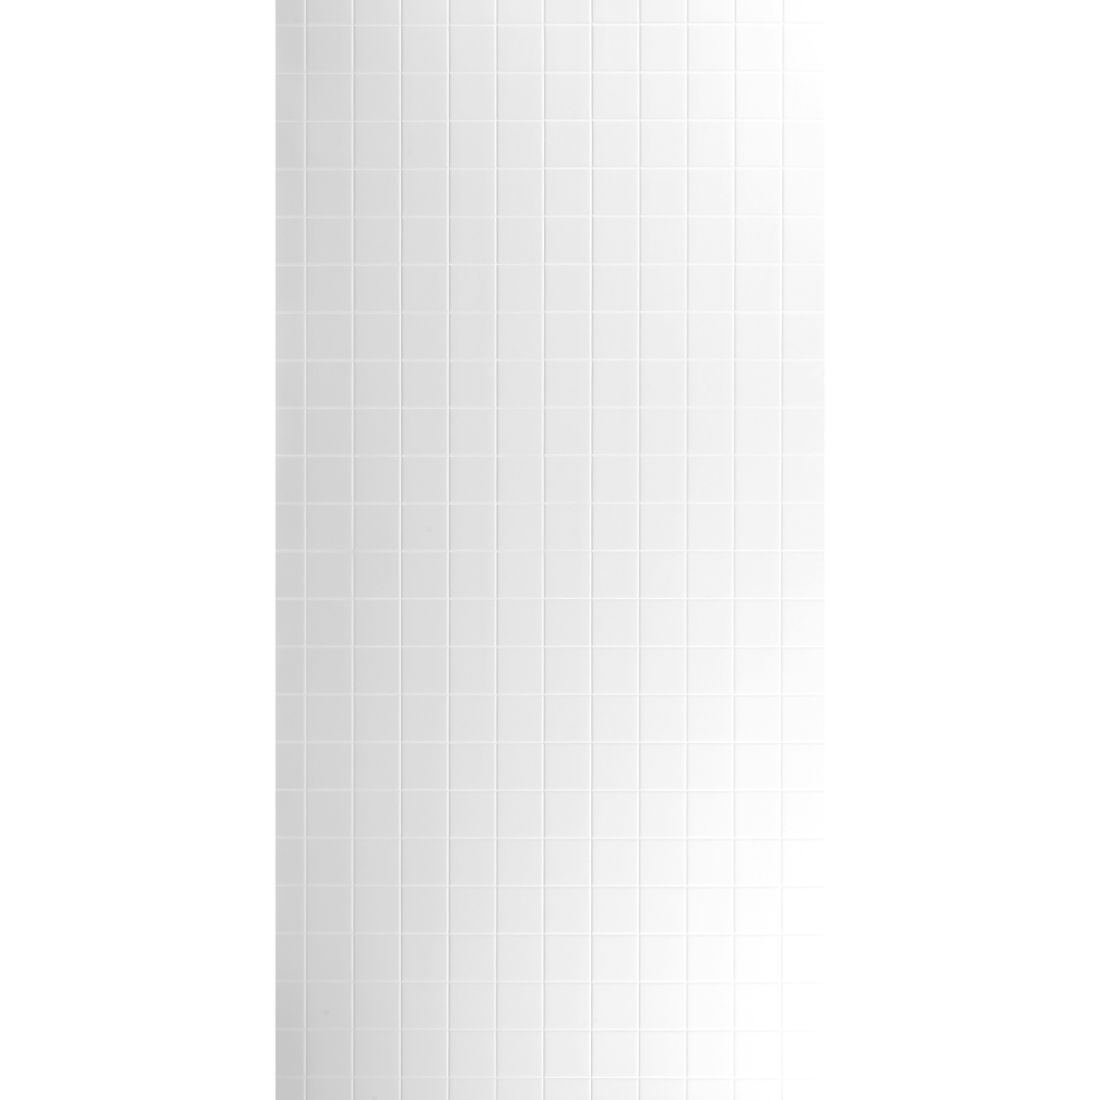 Aqua Wall Lining Panel Polar White Square Tile 2400 x 1200 x 4.5mm